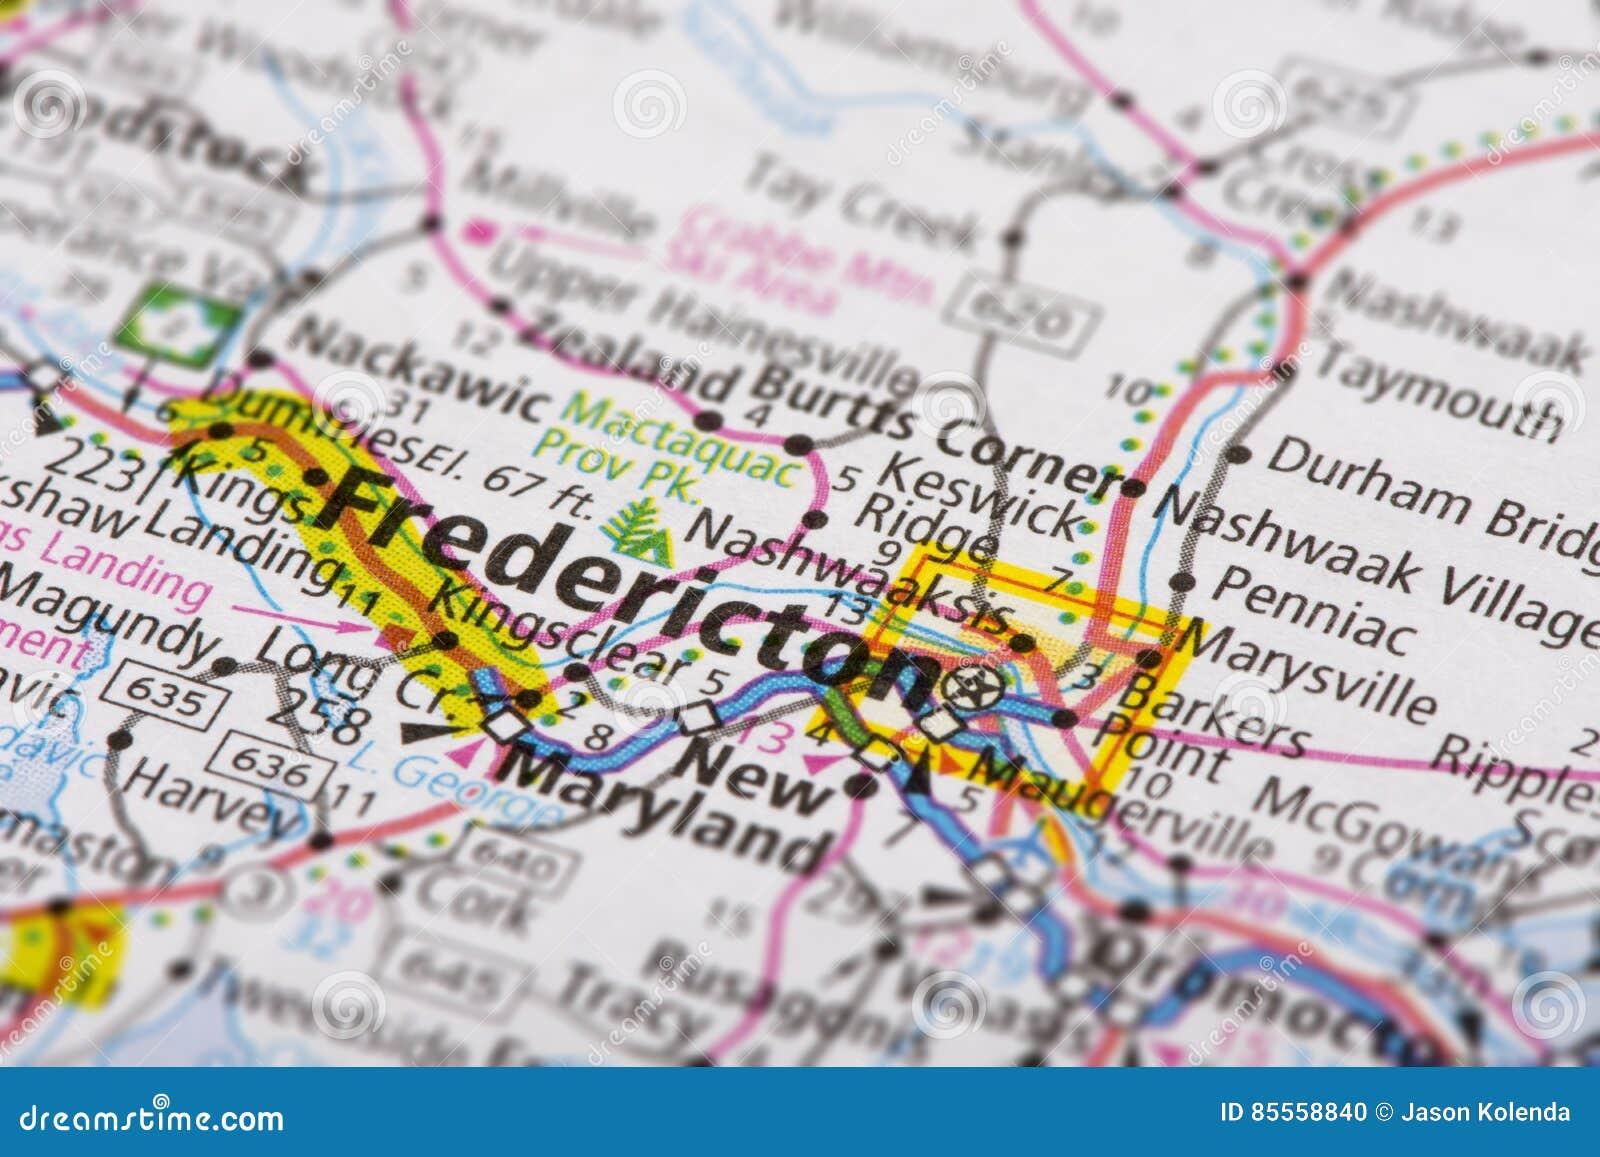 Fredericton New Brunswick Canada Stock Photo Image Of Atlas